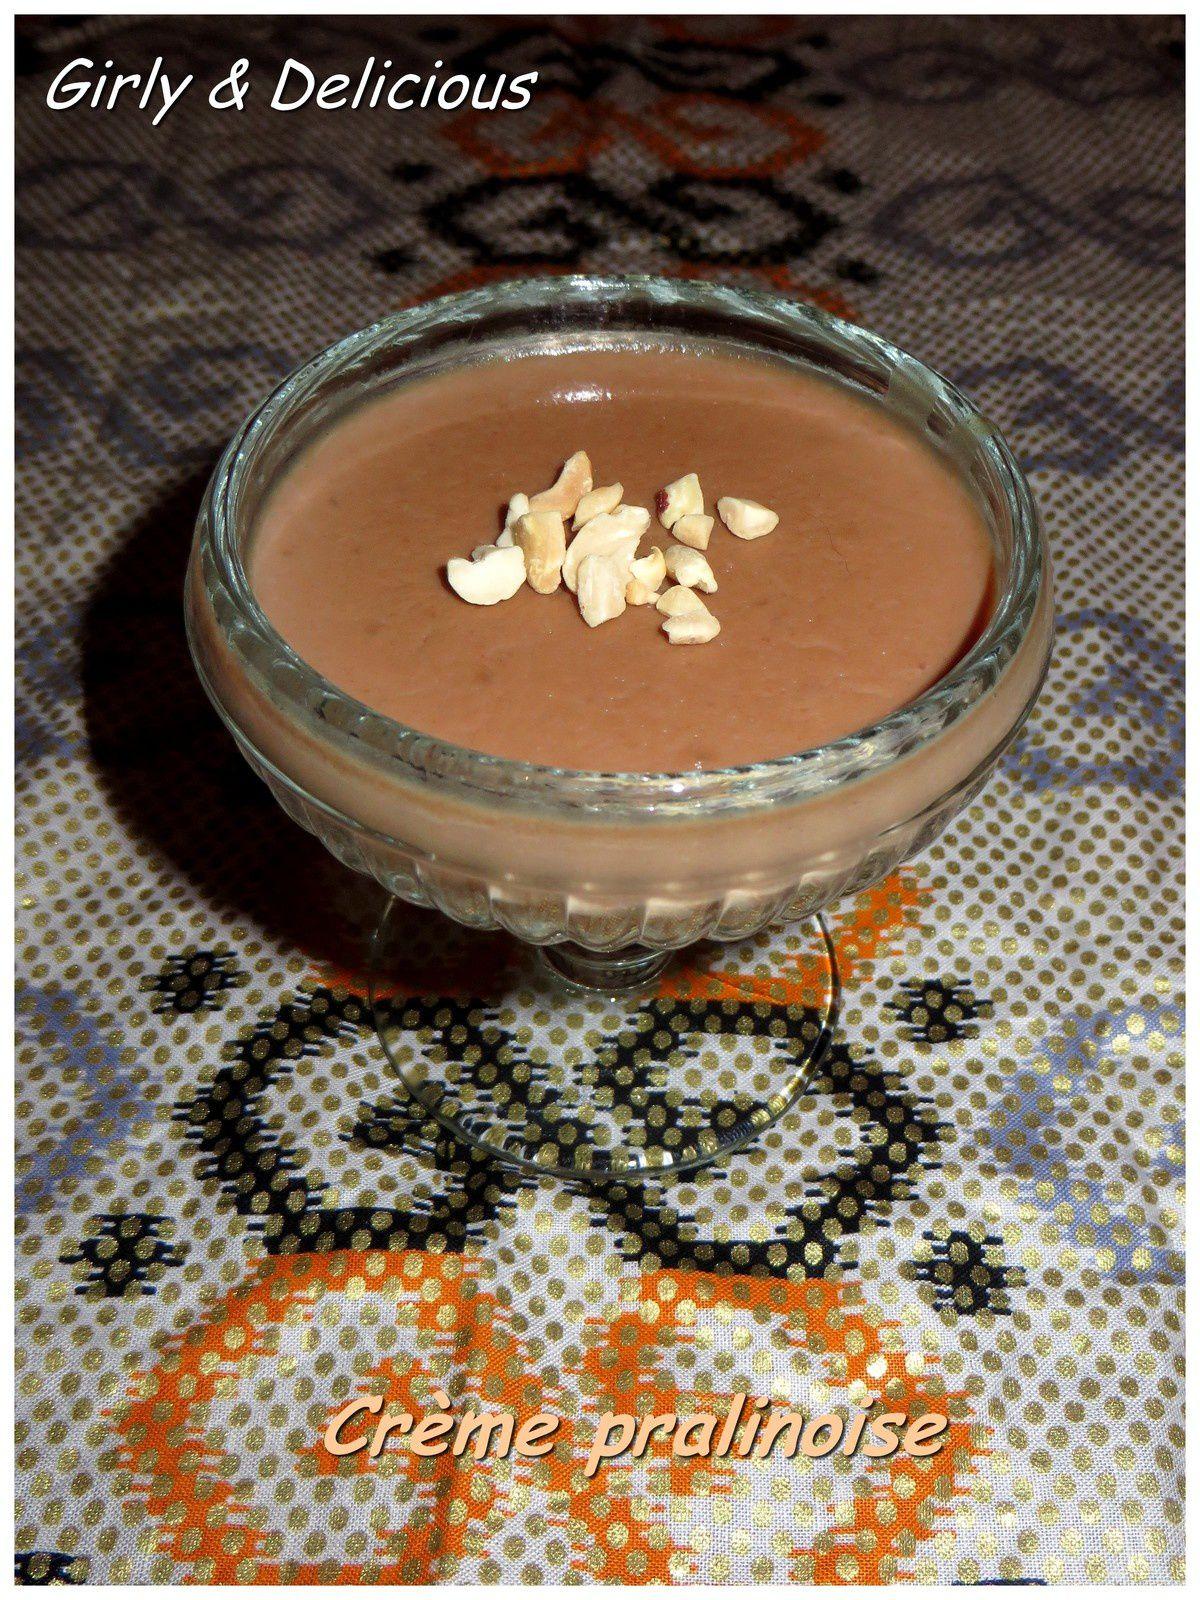 Crème pralinoise